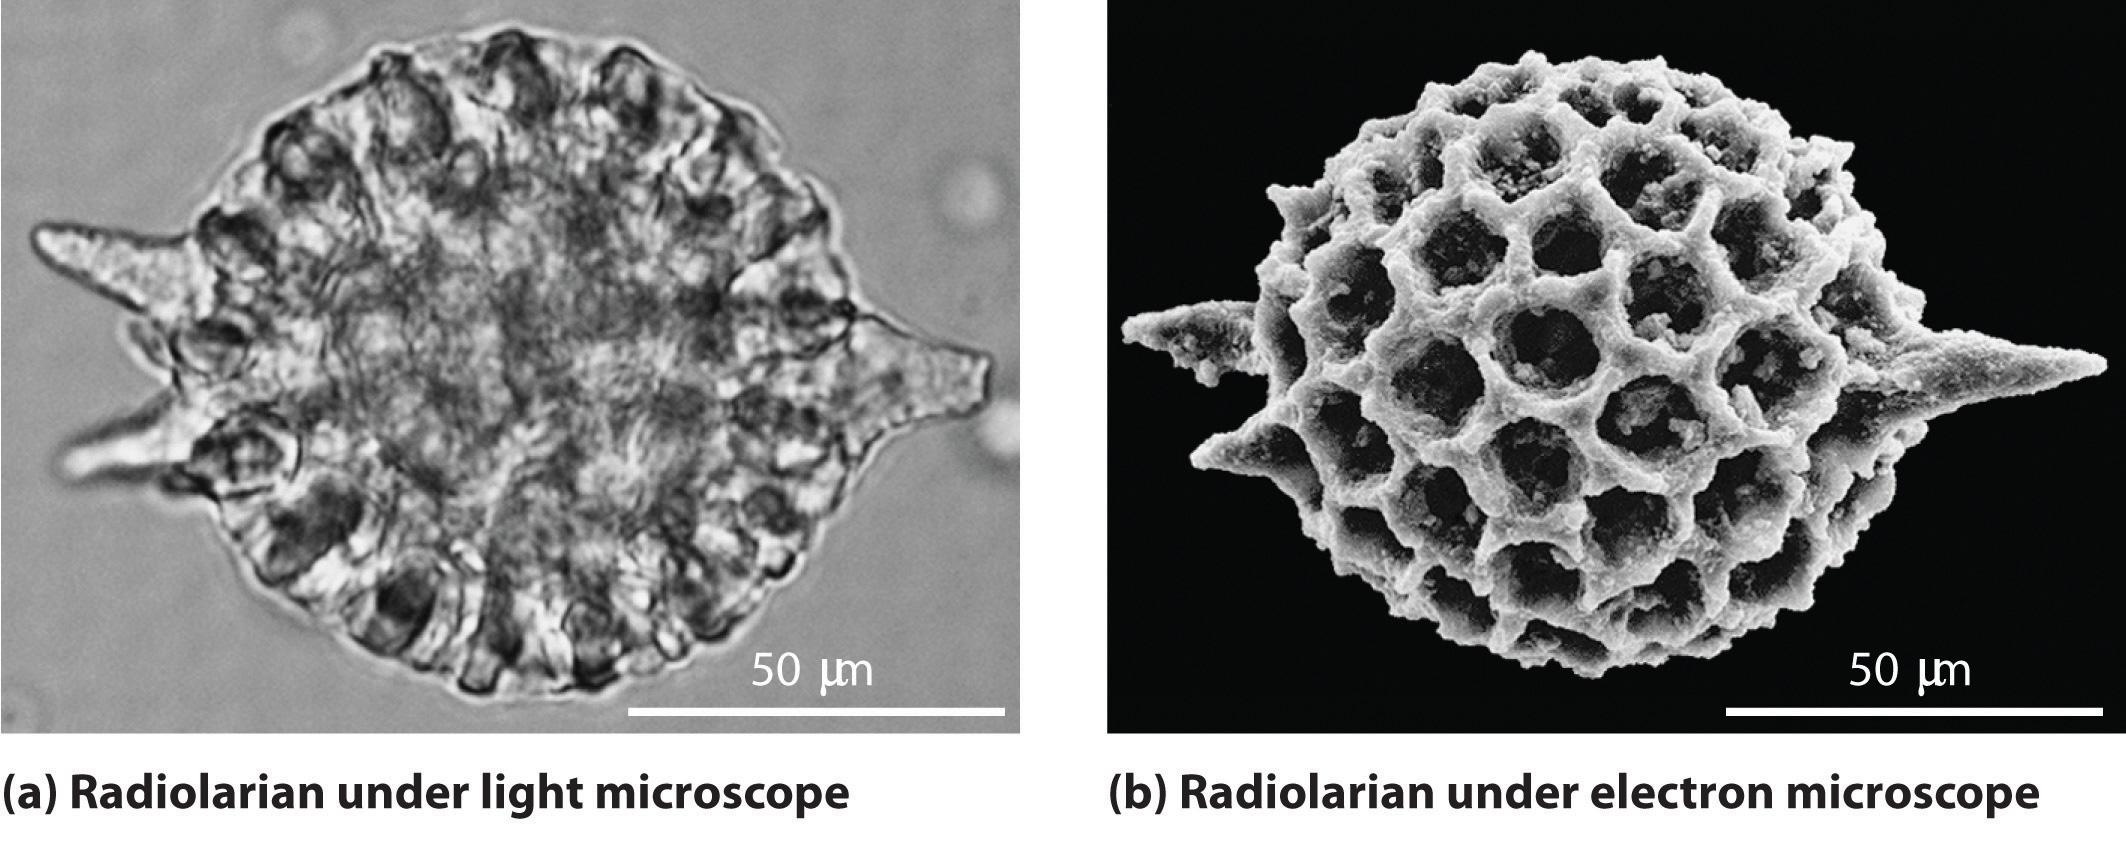 Resolving power of microscopes